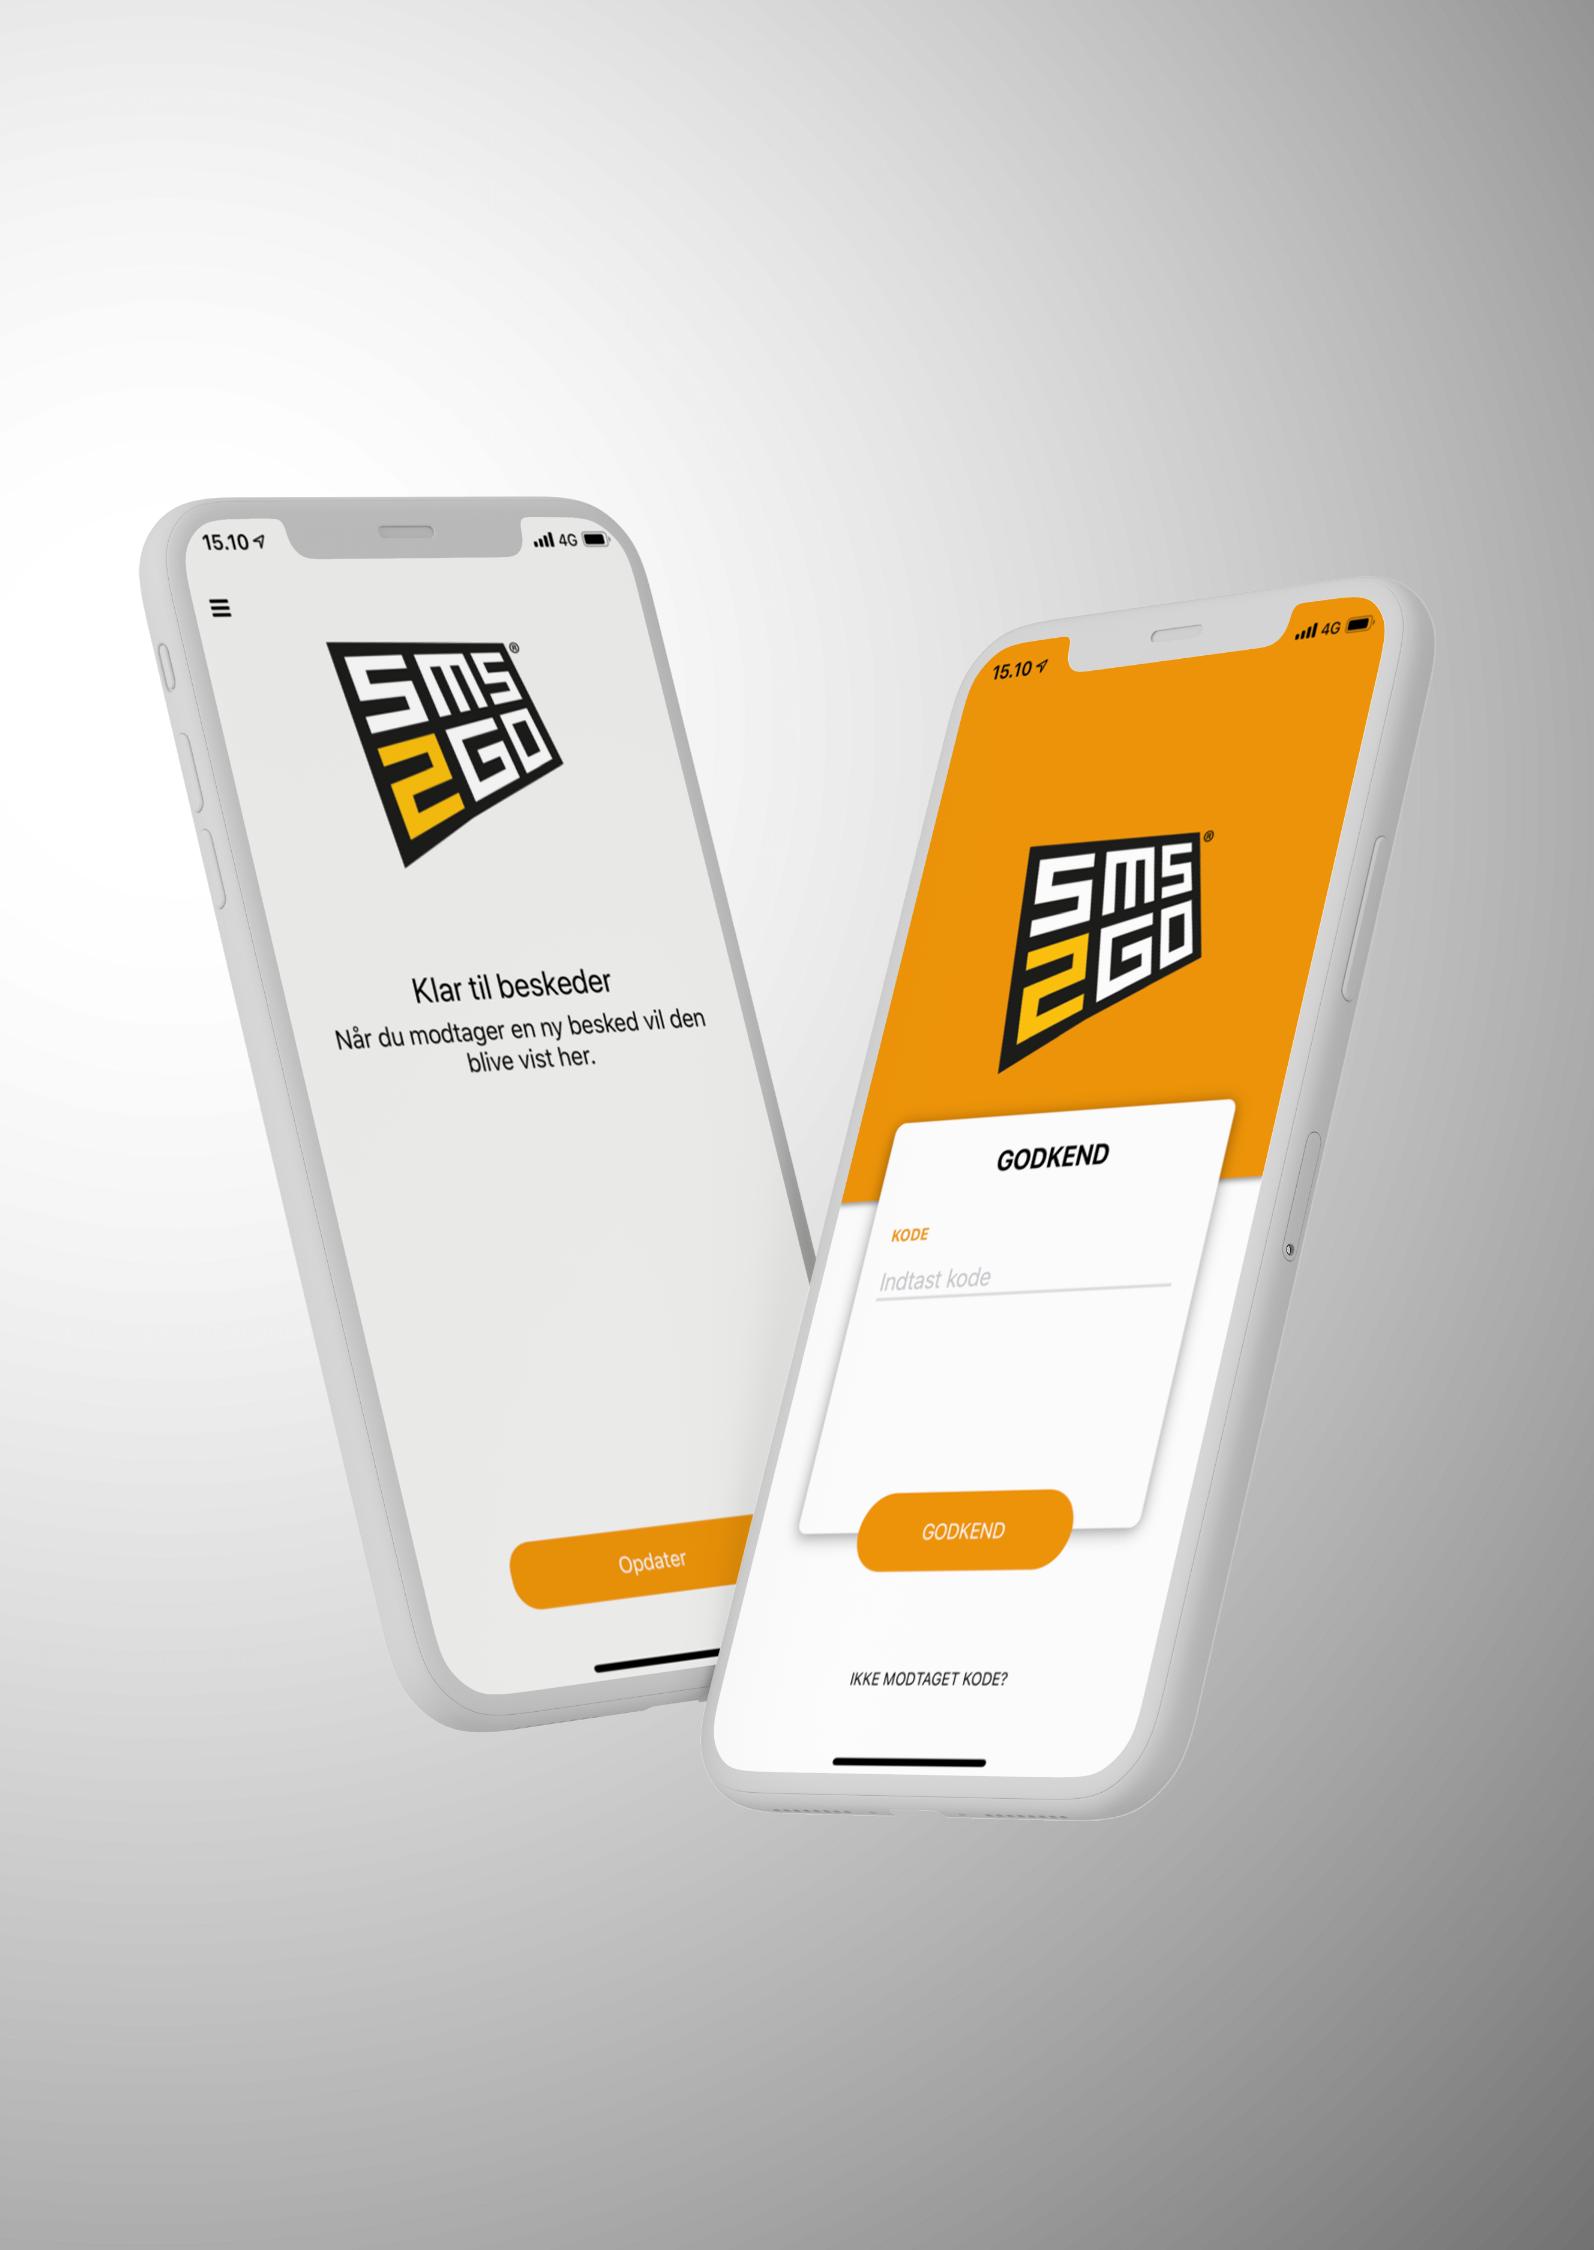 sms2go duo app